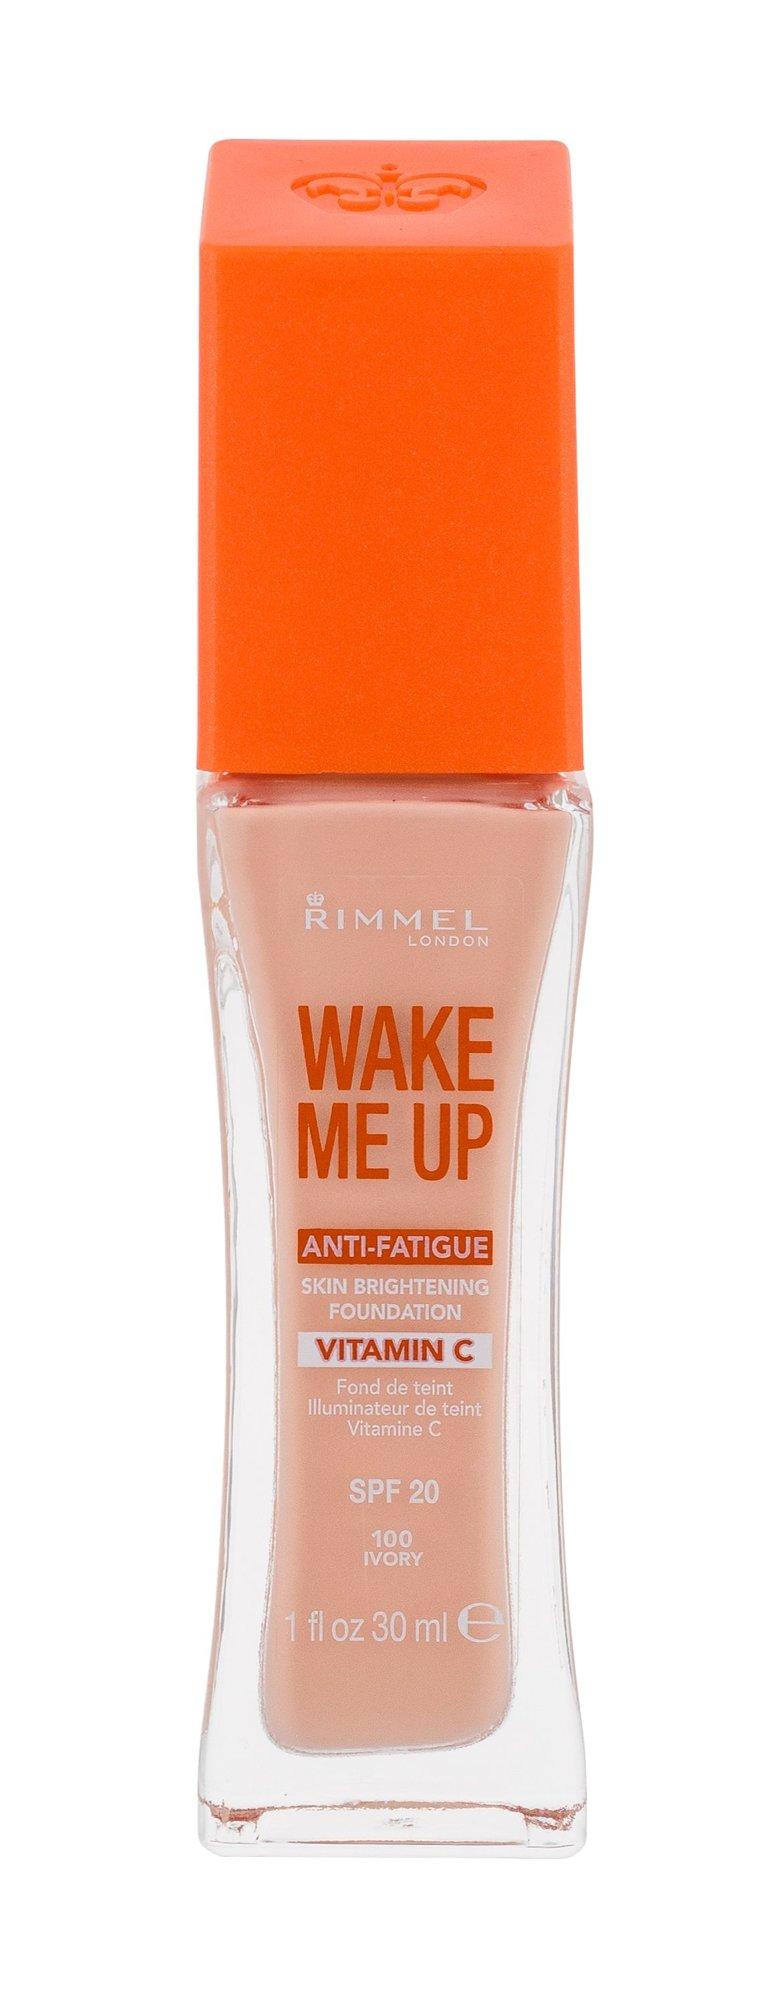 Rimmel London Wake Me Up Cosmetic 30ml 100 Ivory